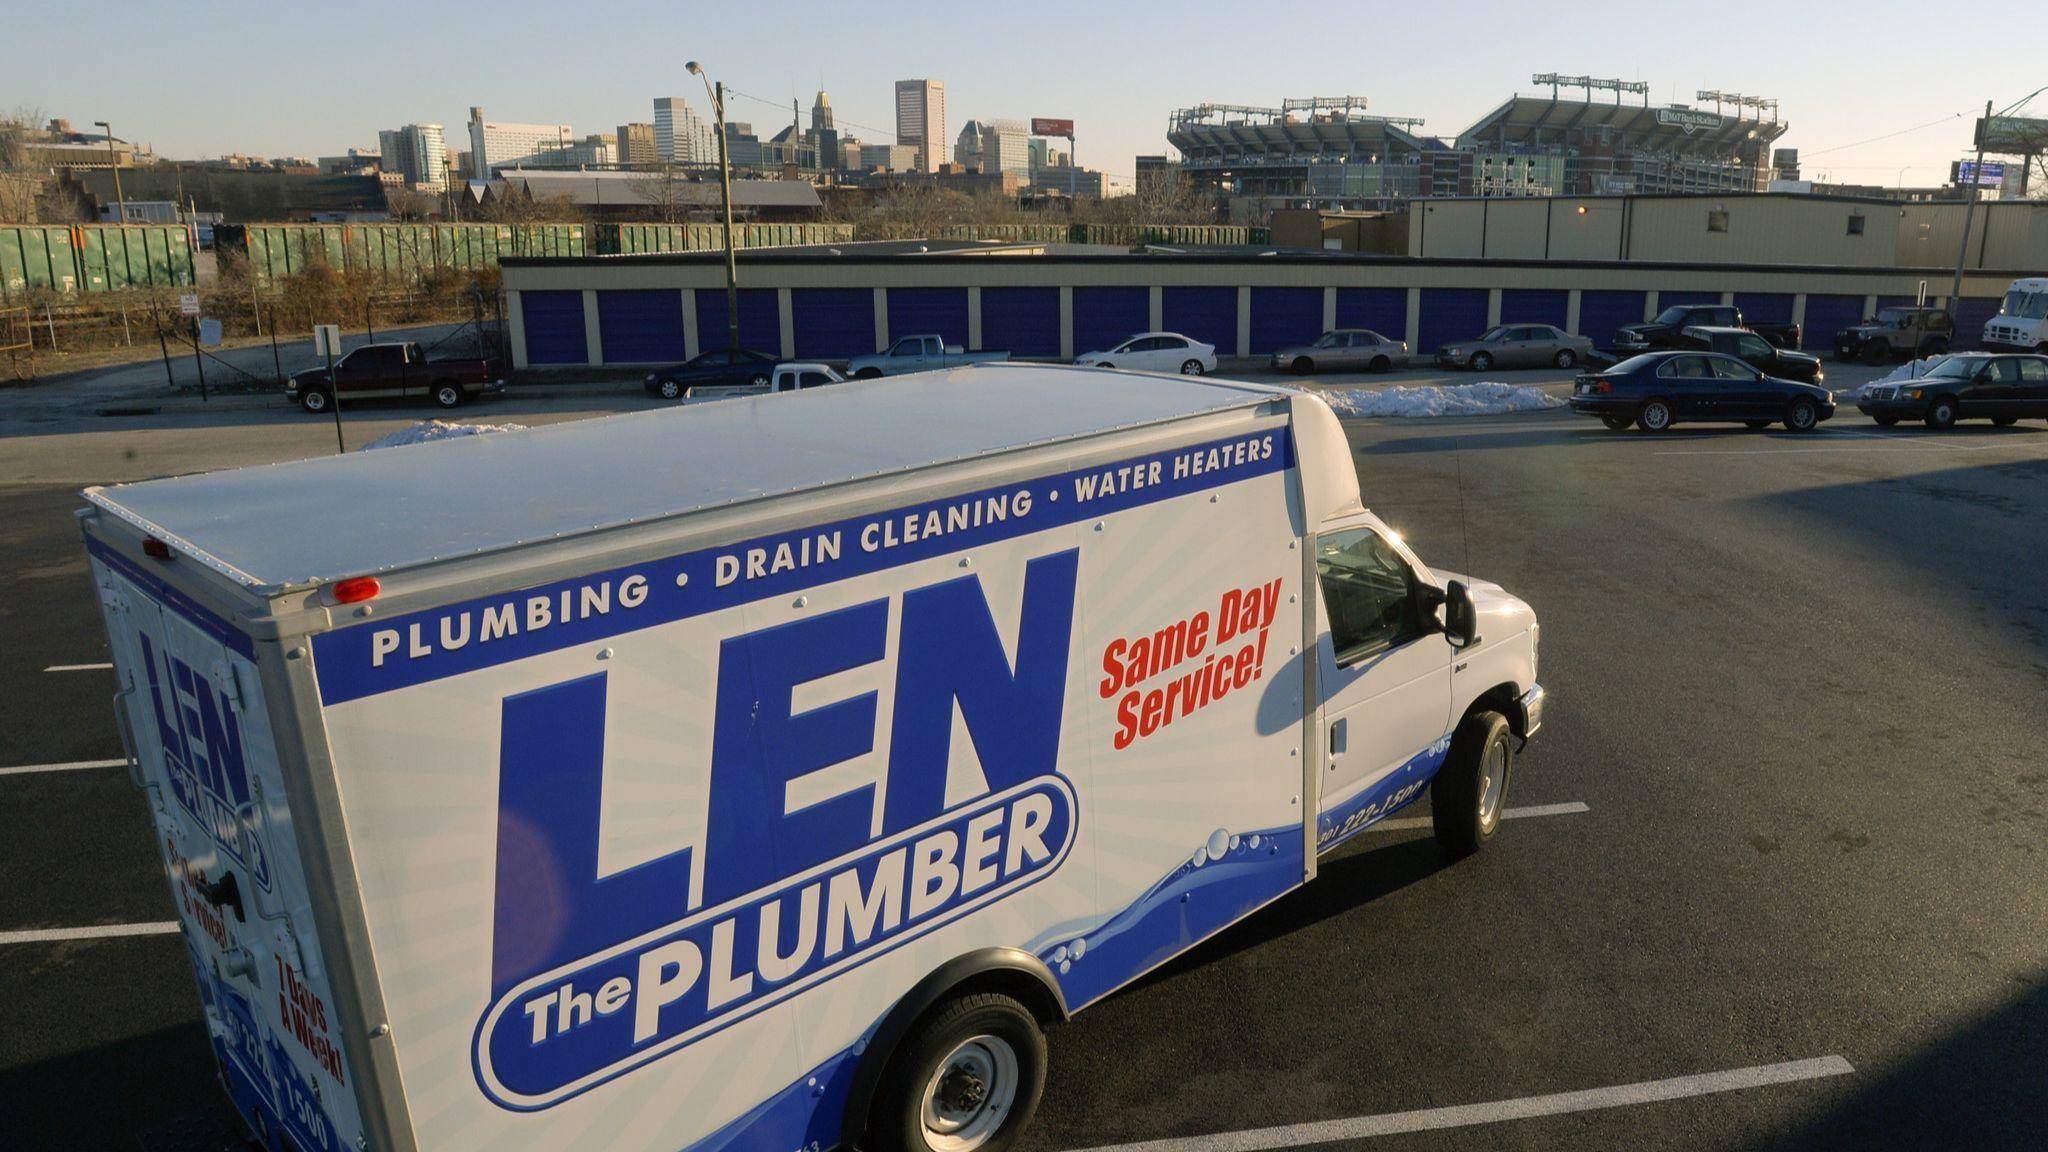 BALTIMORE, MD -- 2/24/14 -- For Sun Magazine Readers' Choice. Best plumber: Len the Plumber. Photo b